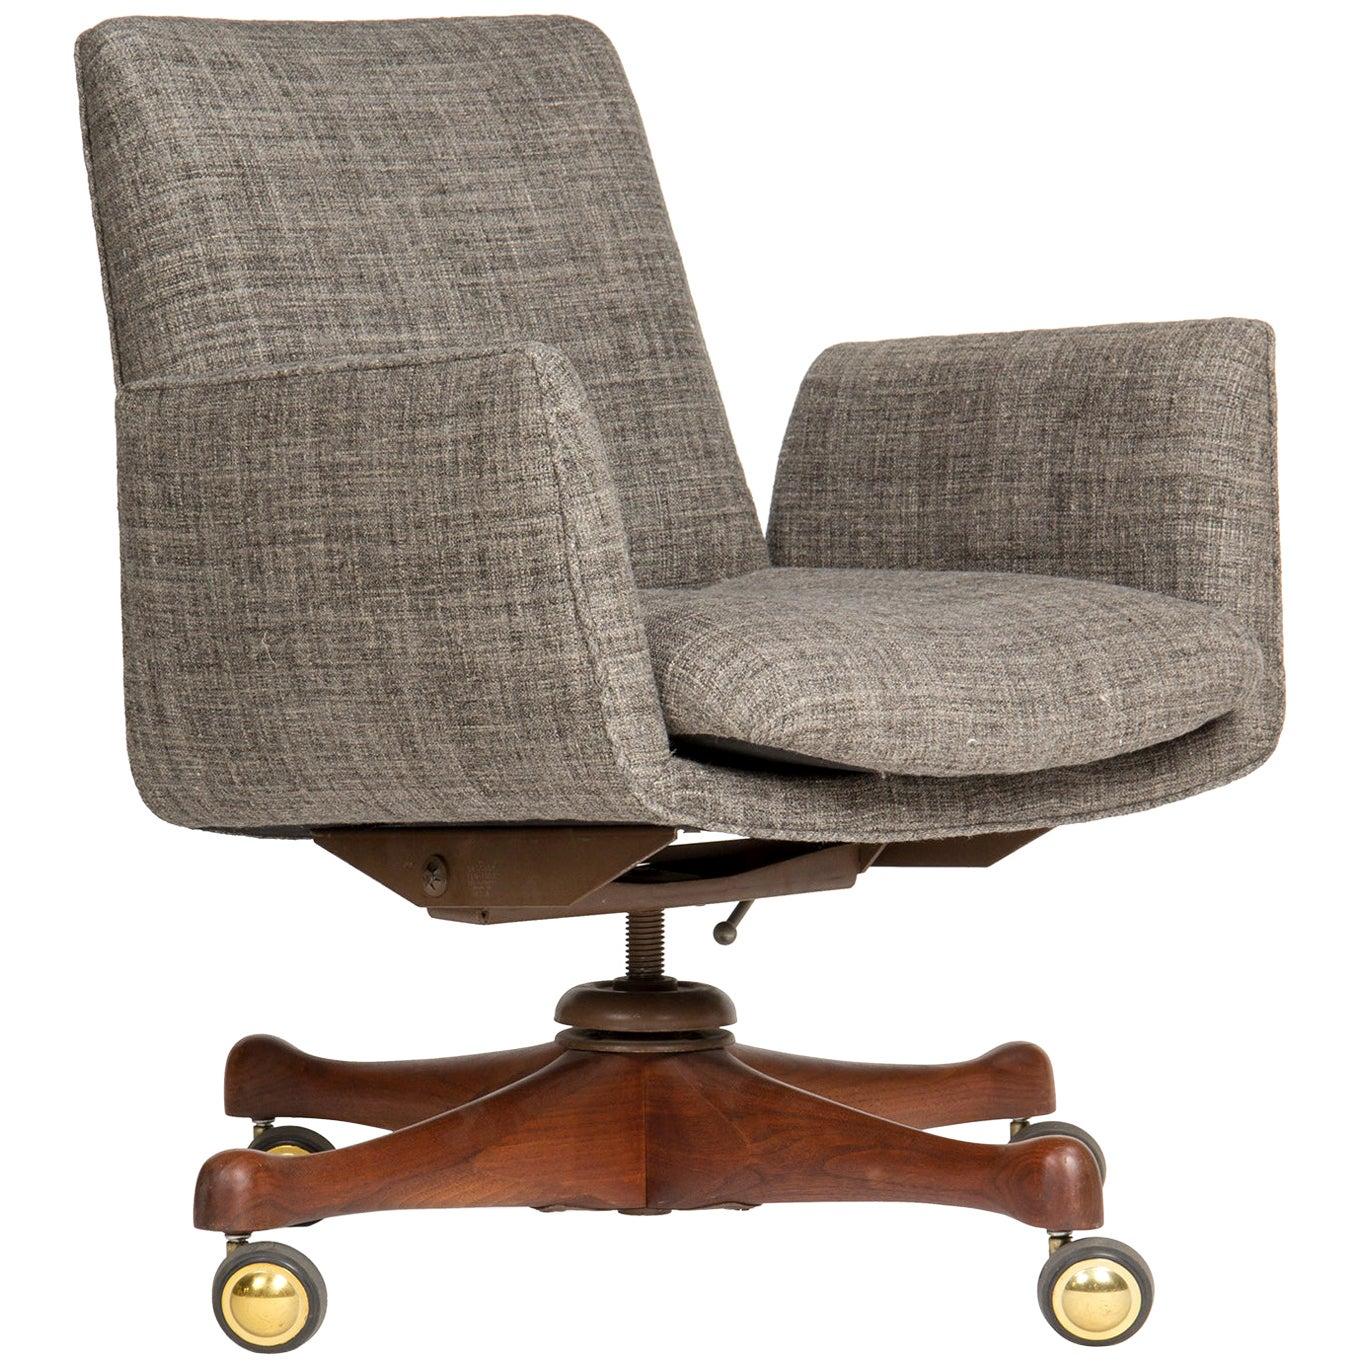 1960s Swiveling Desk Chair by Vladimir Kagan